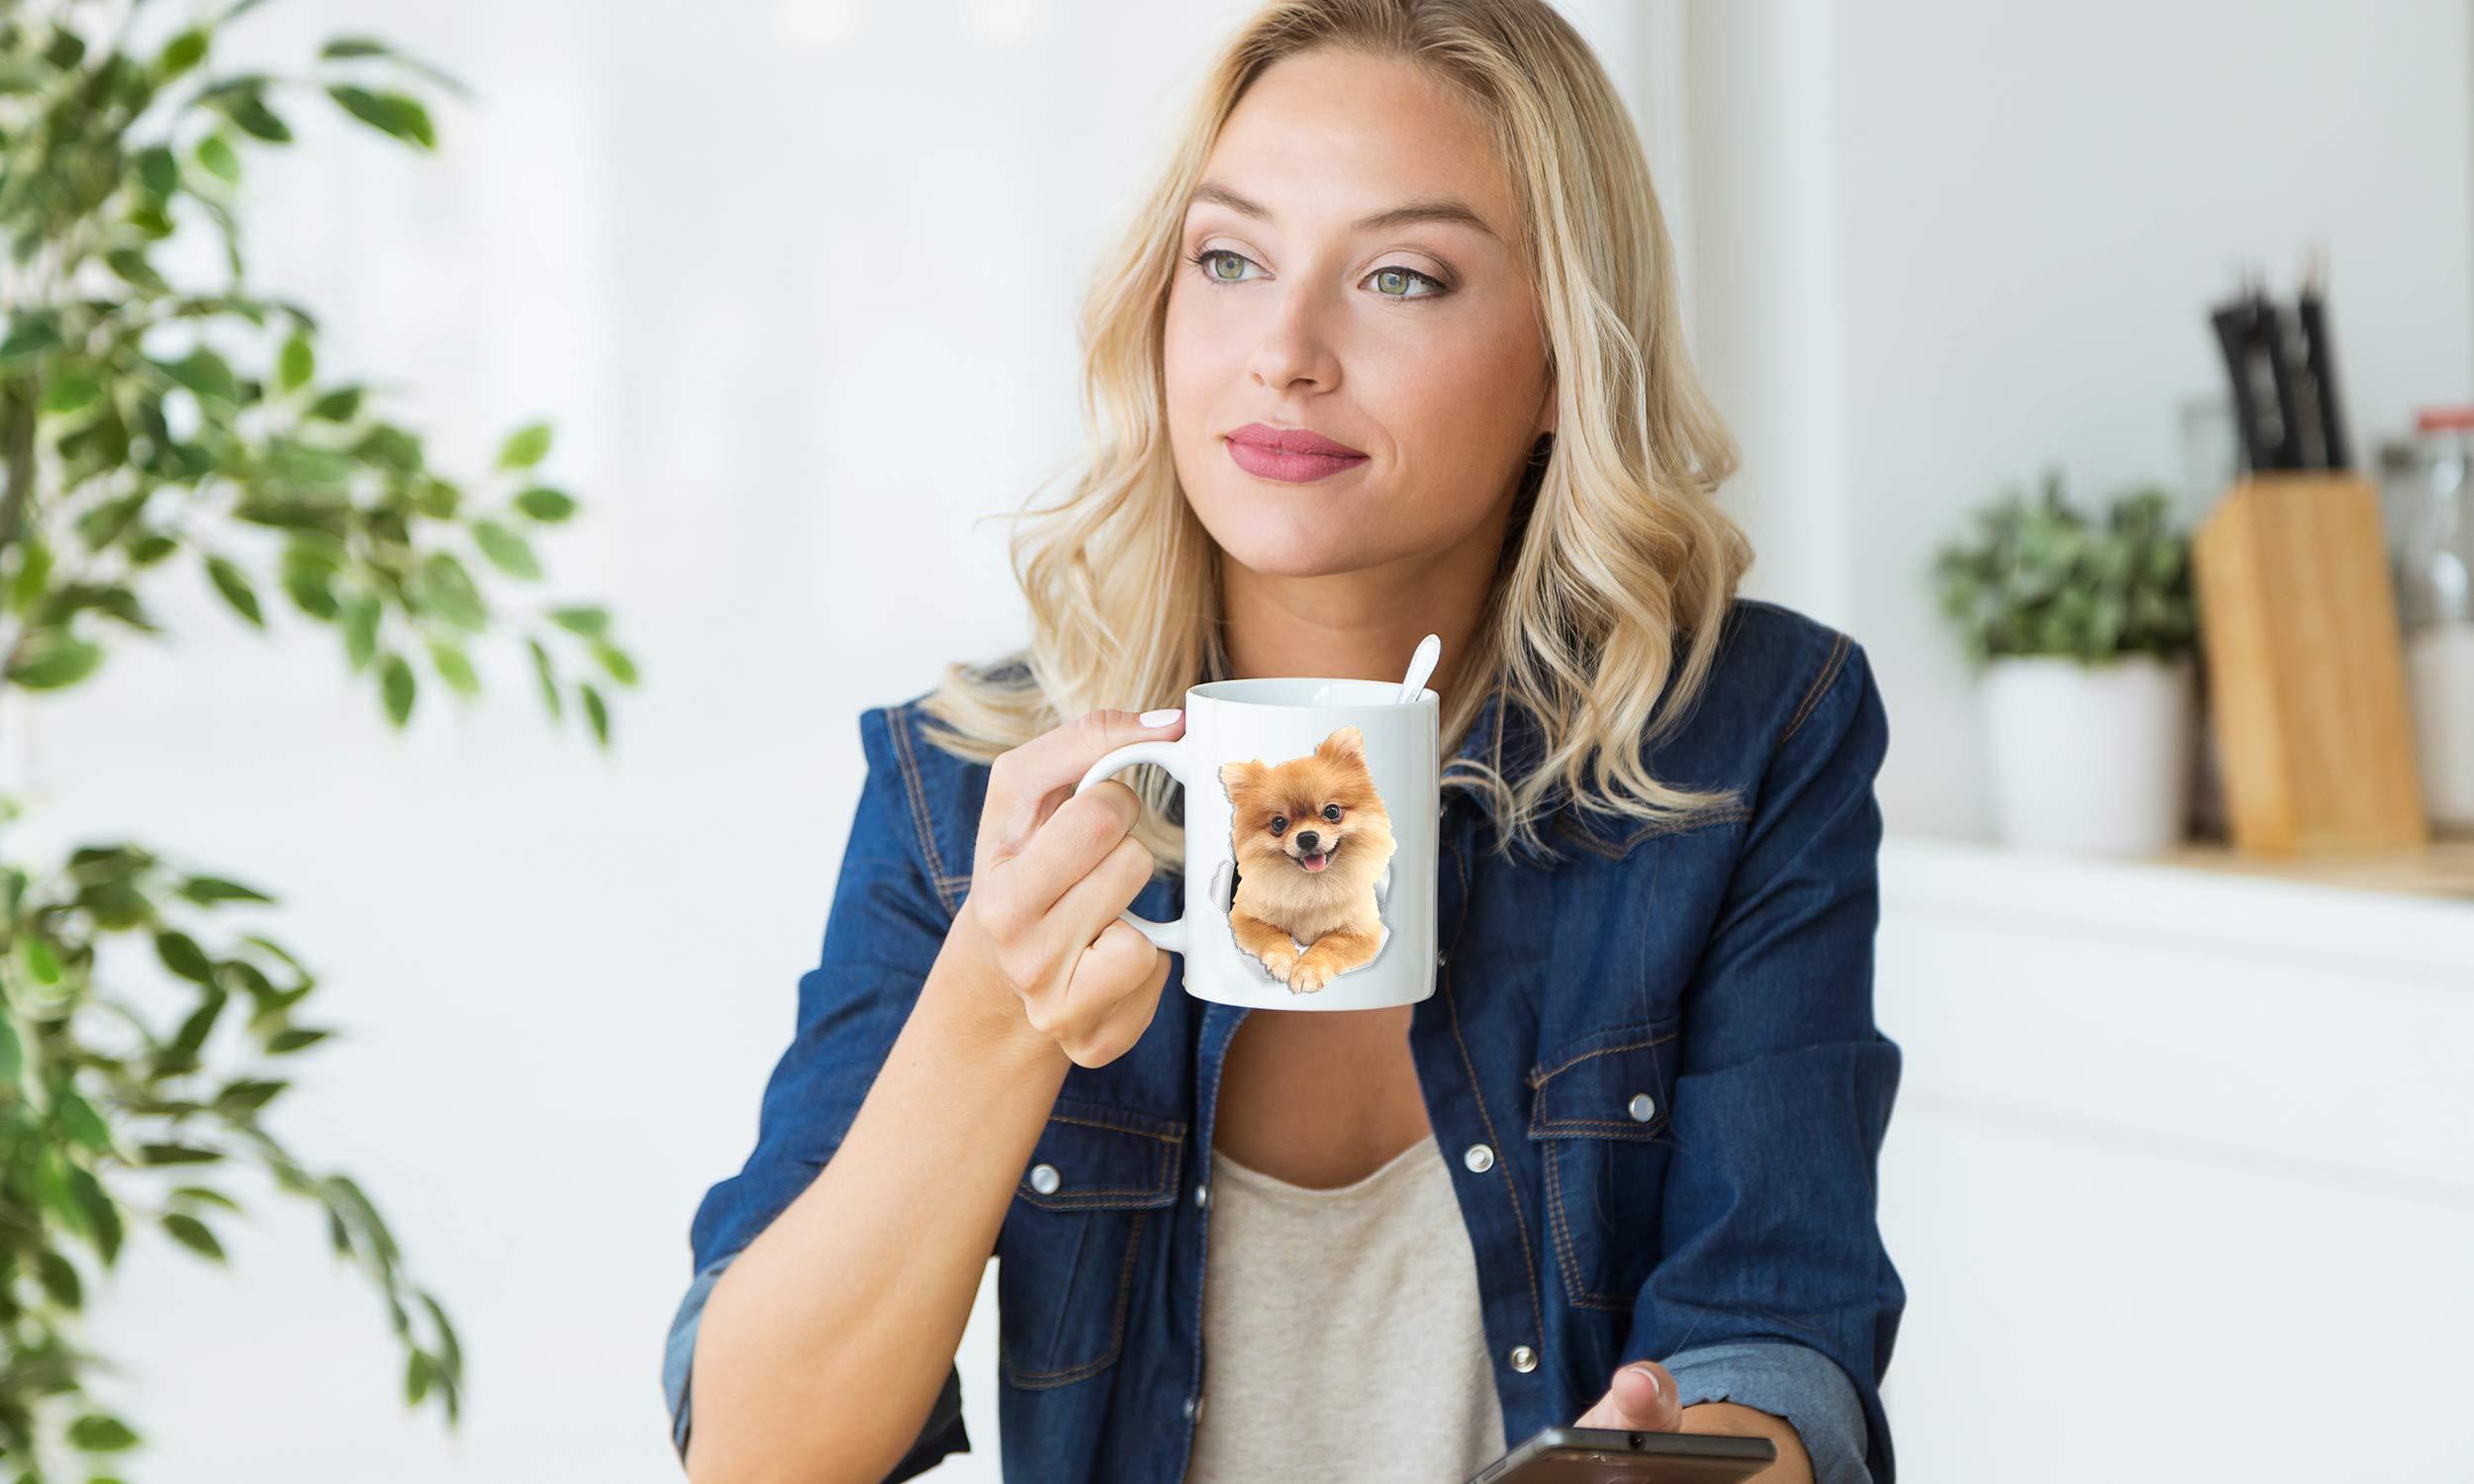 Cute Pomeranian Coffee Mug - German Spitz Ceramic Mug - Perfect Pomeranian Gifts for Dog Lover - Cute PomPom Cup for Pomeranian Mom and Dad - Great Birthday or Christmas Present for Dog Owner (11oz) 2